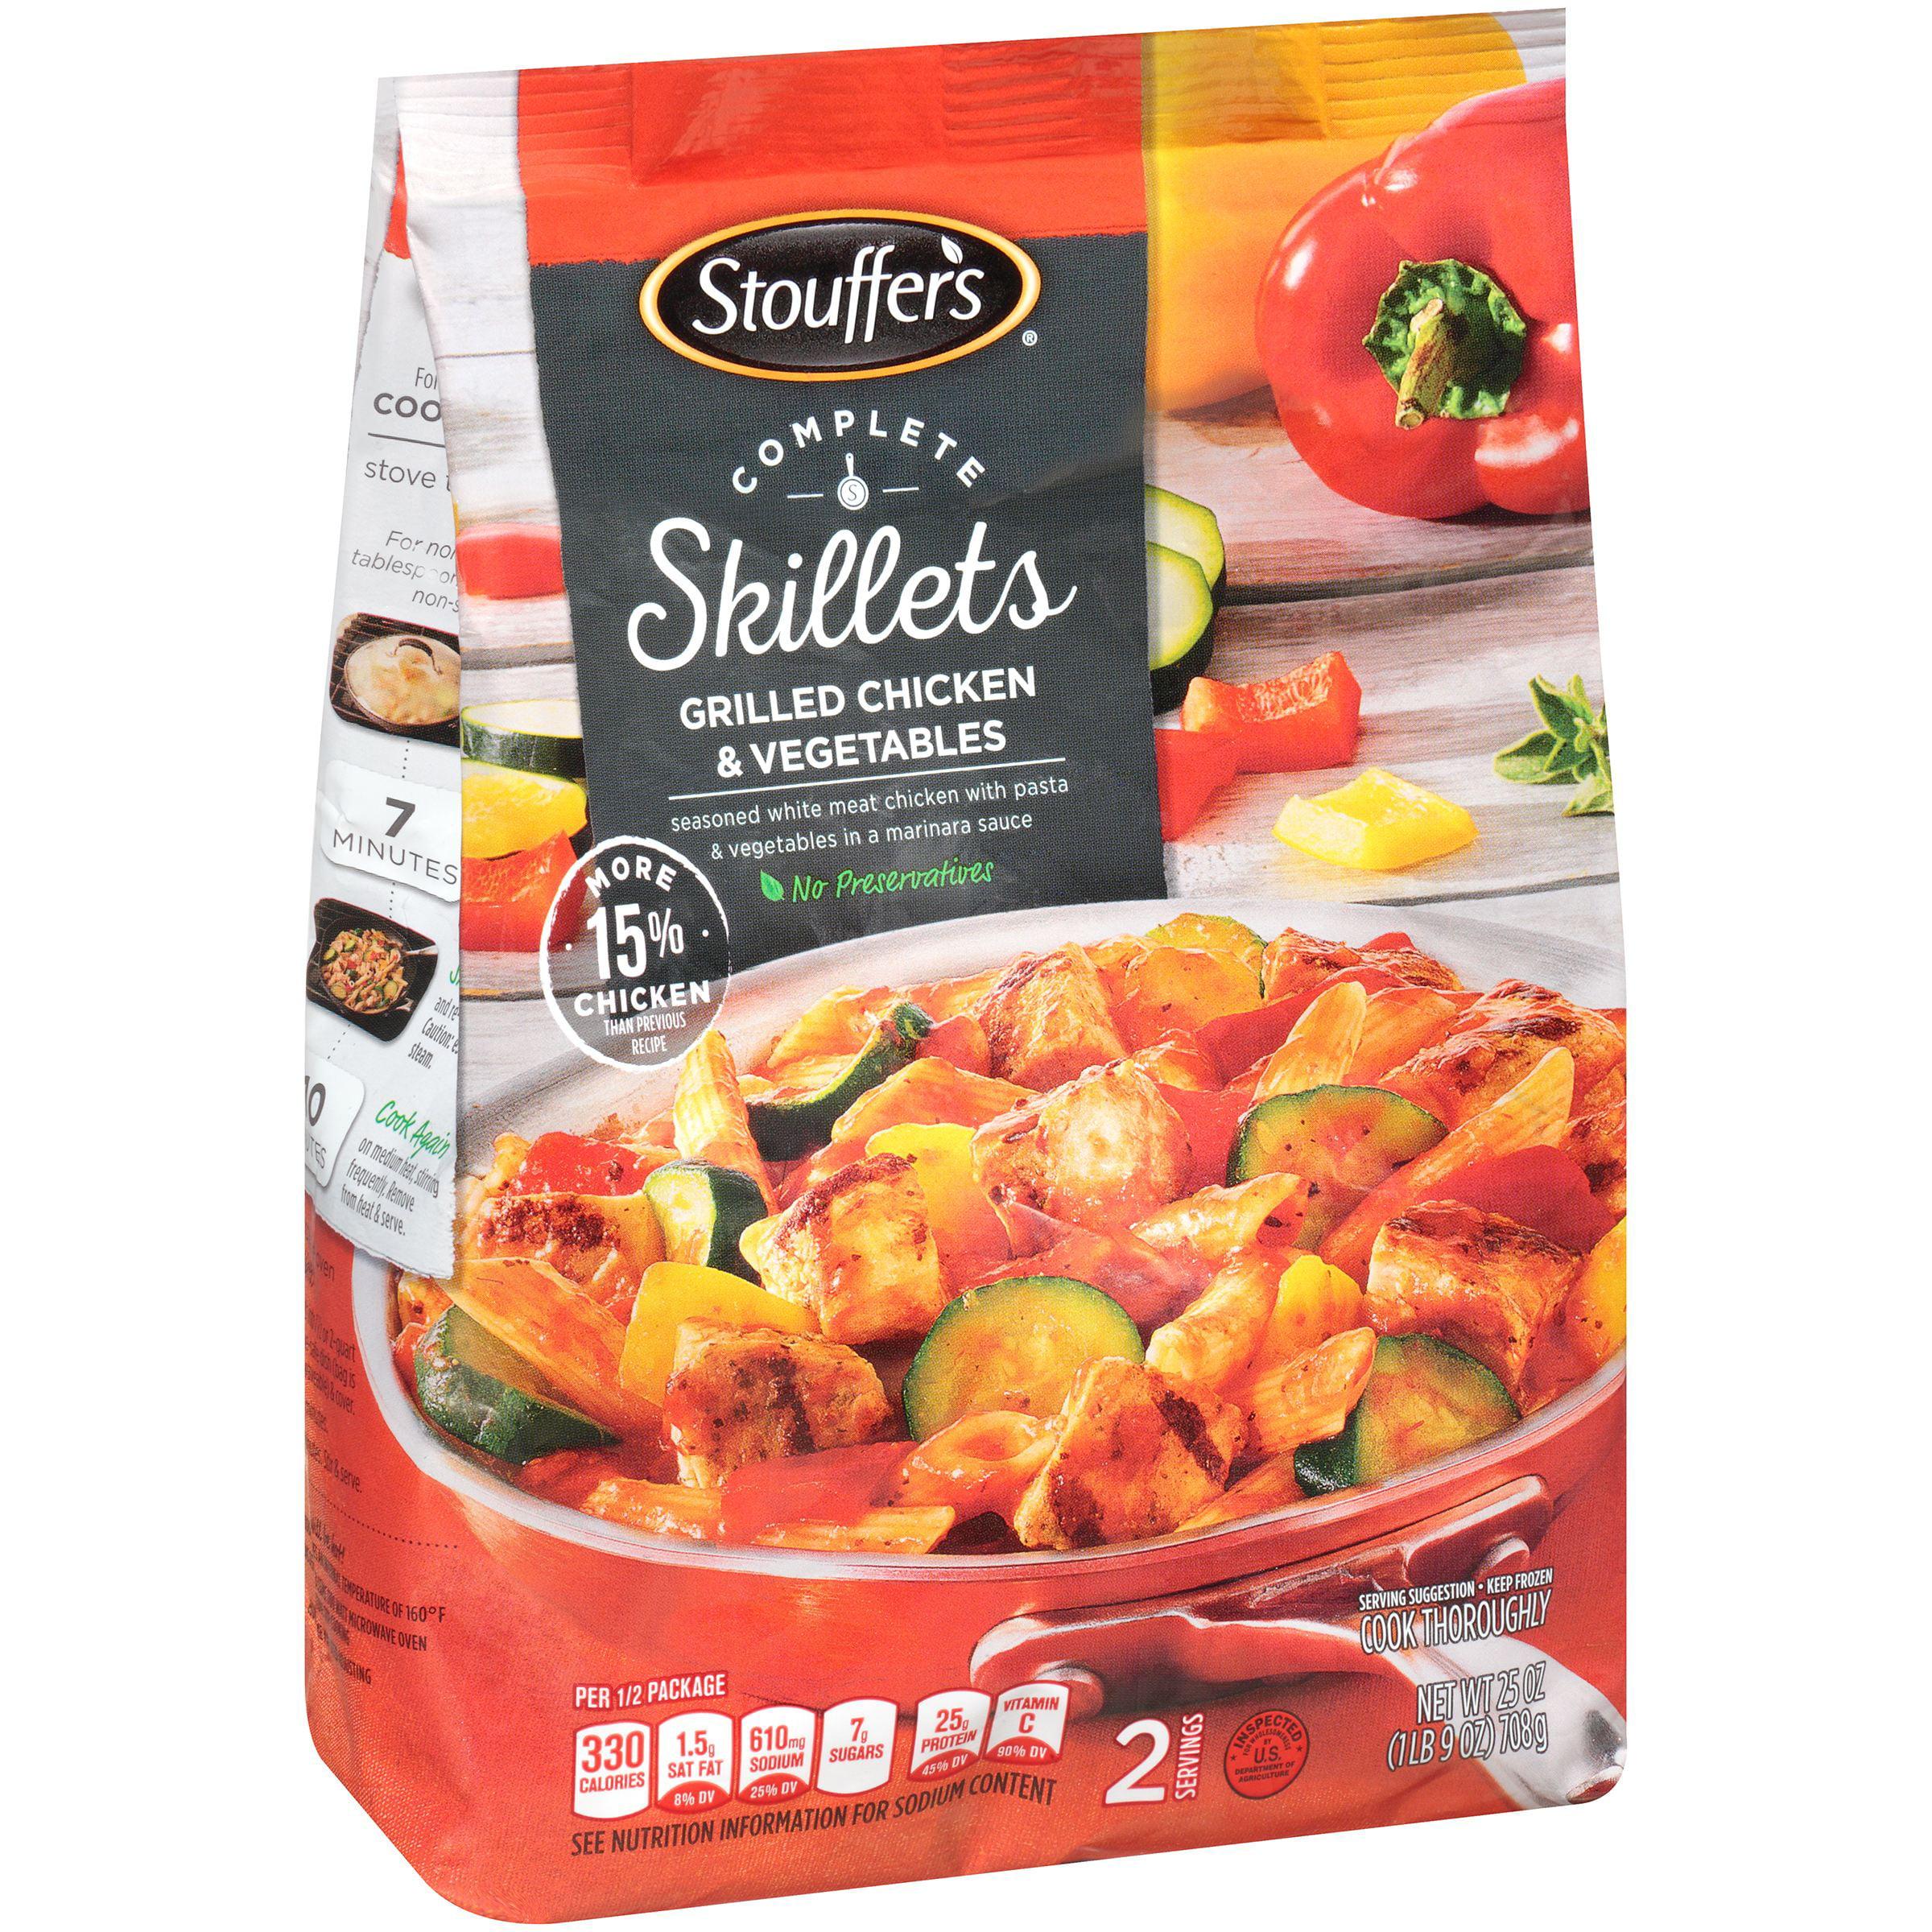 Stouffer's Complete Skillets Grilled Chicken & Vegetables, 25.0 OZ